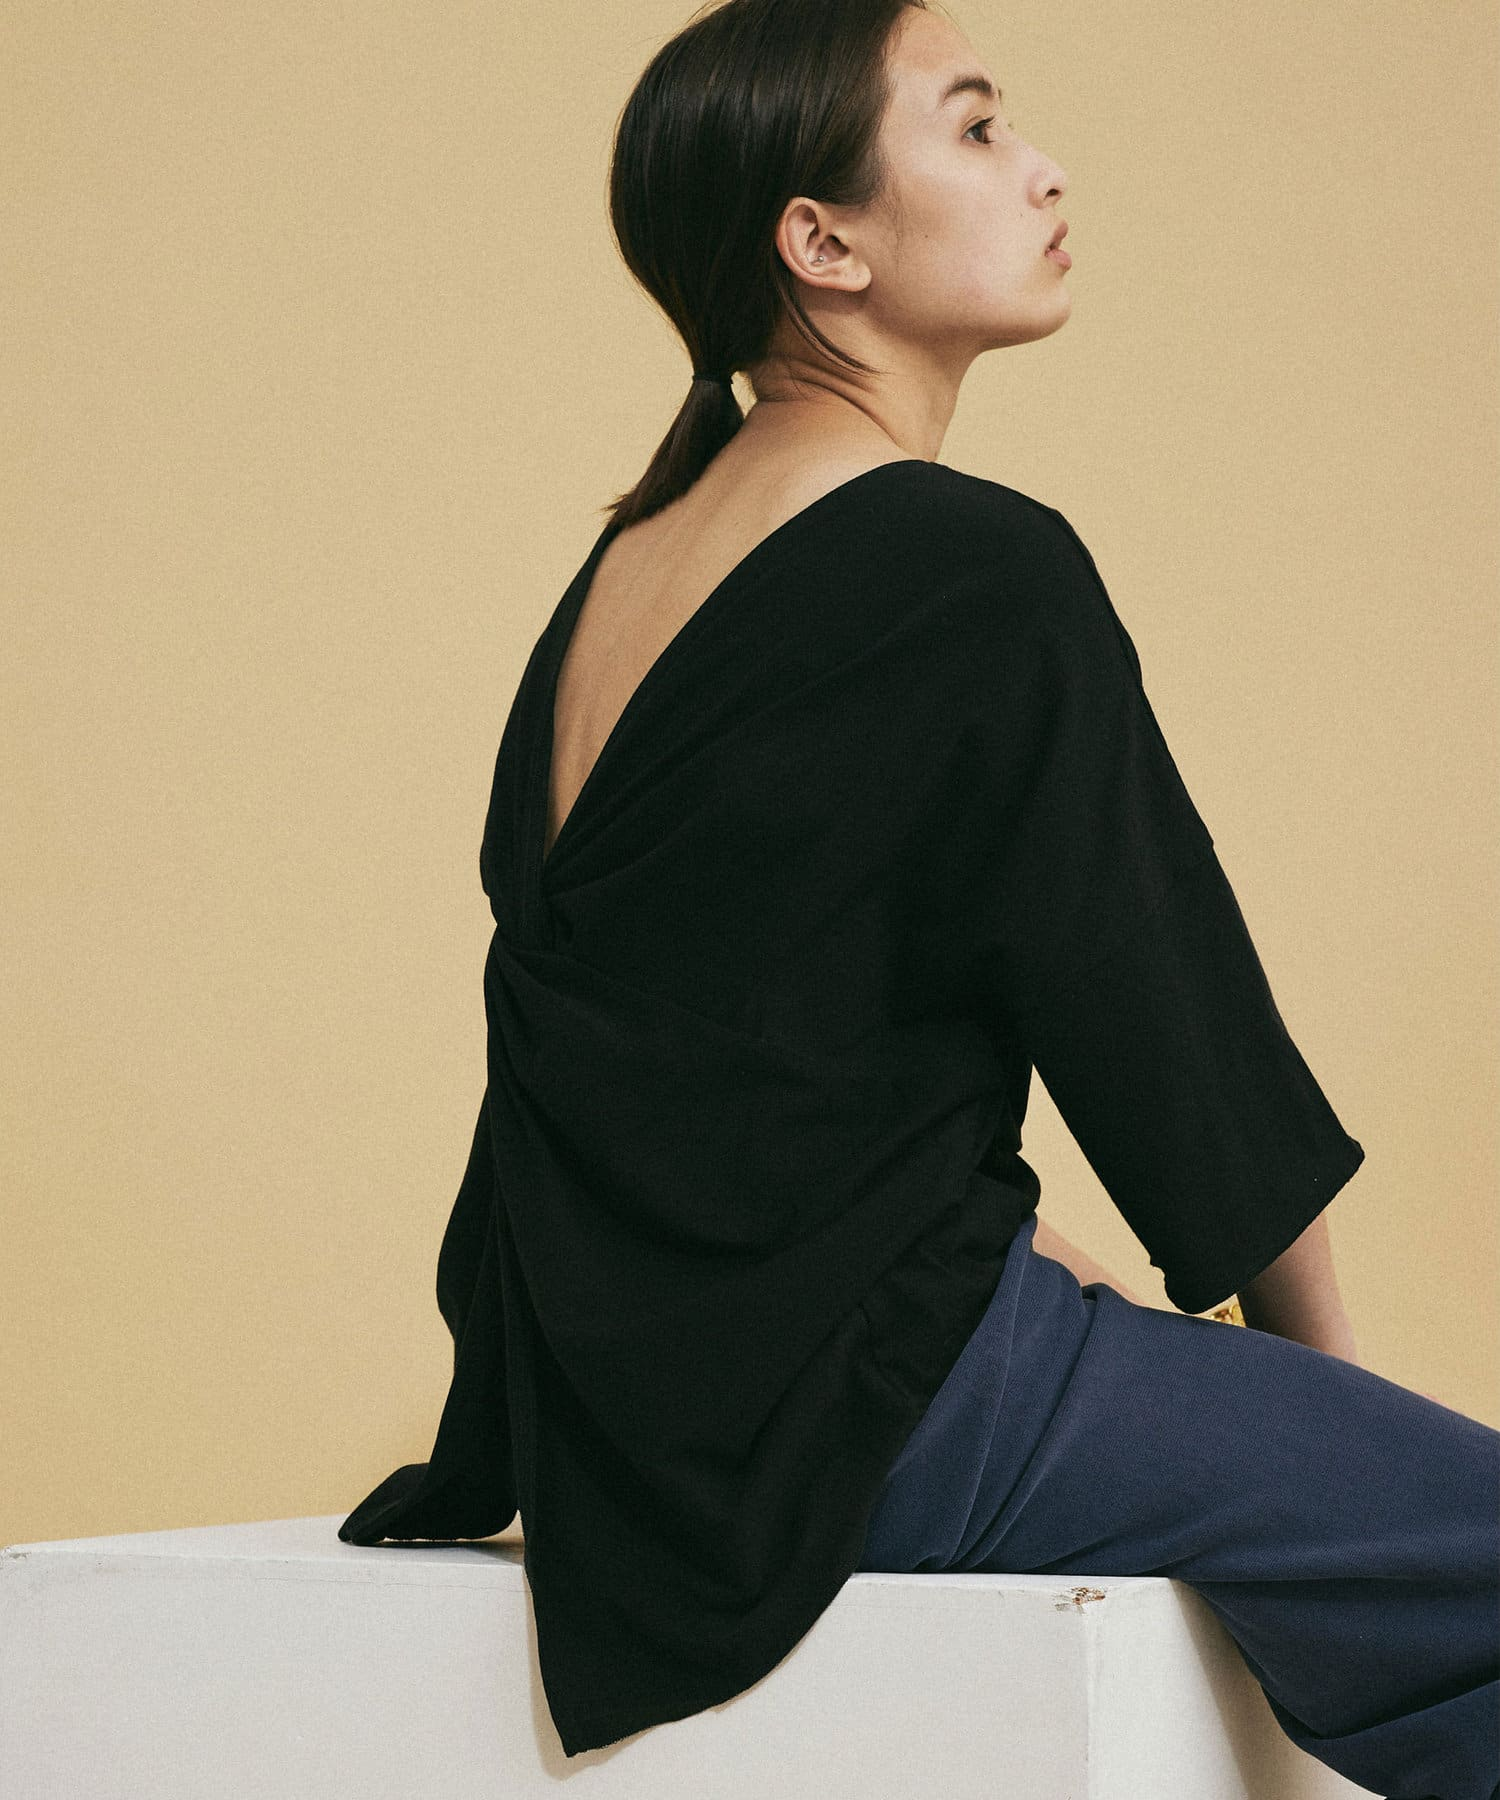 GALLARDAGALANTE(ガリャルダガランテ) バックツイストオーバーTシャツ【オンラインストア限定商品】